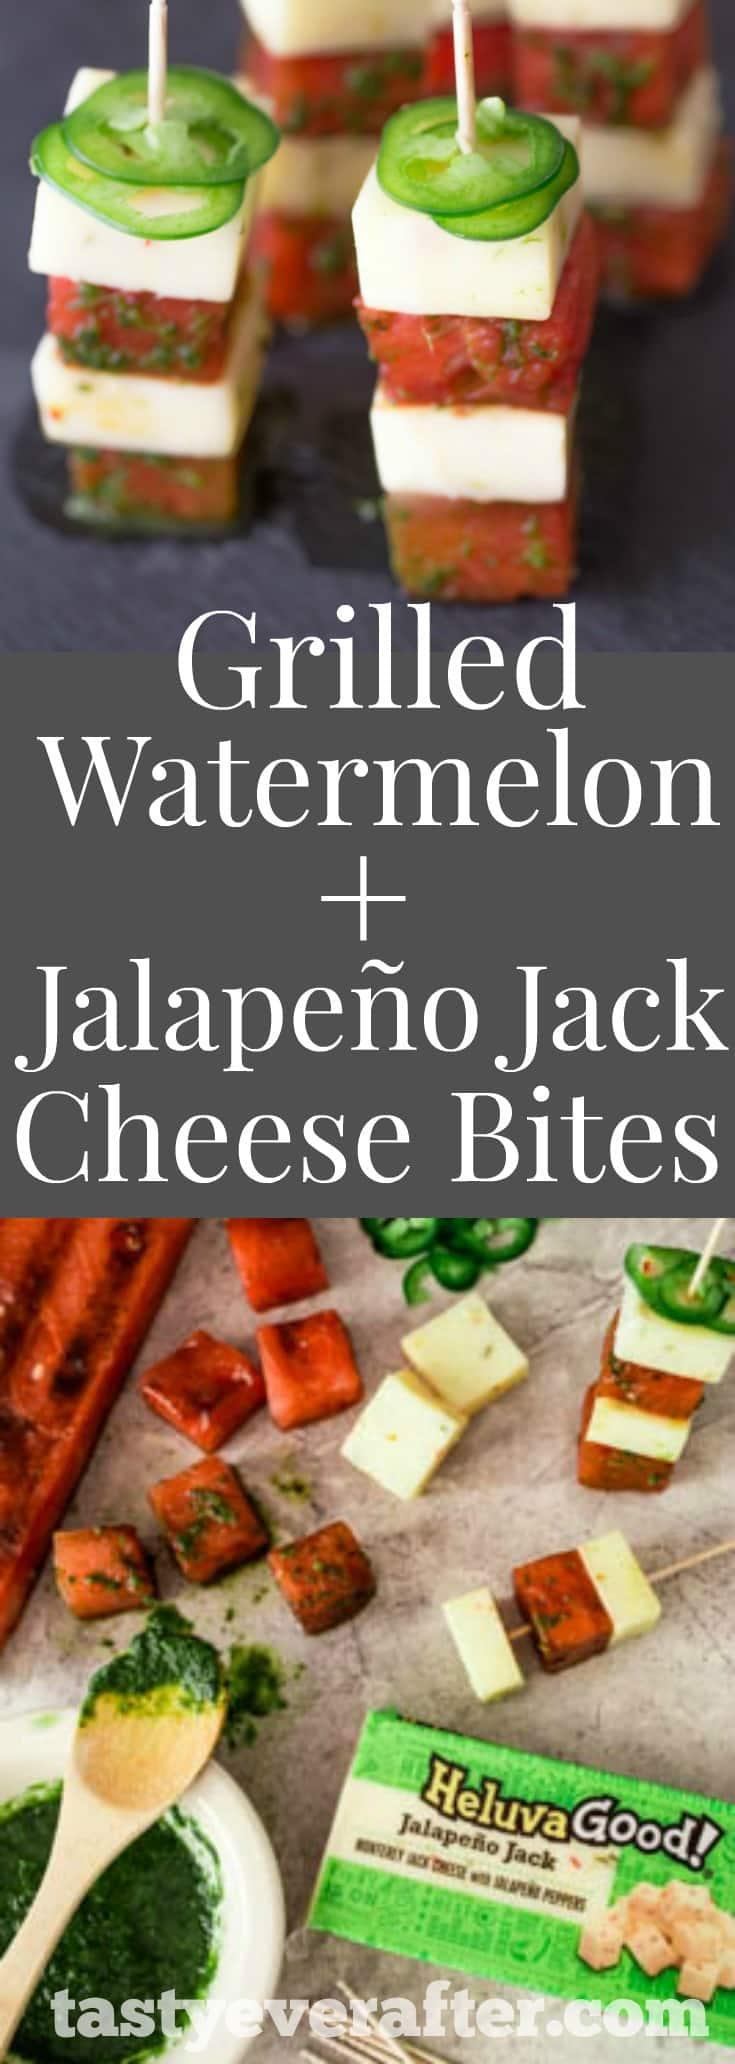 GrilledWatermelonJalapeñoJackBitesPIN - Grilled Watermelon + Jalapeño Jack Cheese Bites Recipe